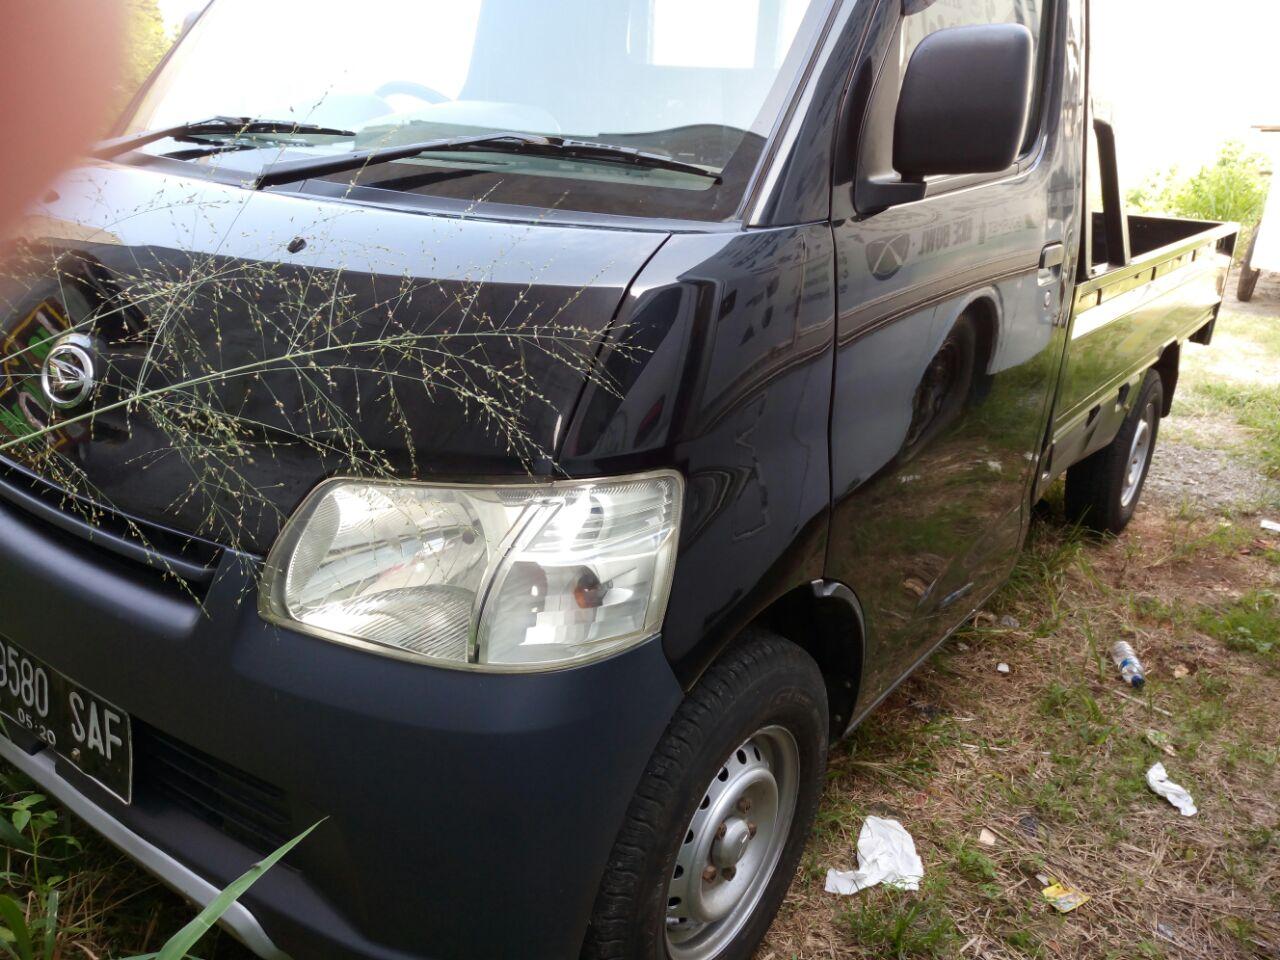 Sewa Grandmax pickup 2013 - 2015 (bisa lepas kunci) di toko Pusat Sewa Mobil daerah Jakarta Selatan, DKI Jakarta - Sewa menyewa jadi lebih mudah di Spotsewa